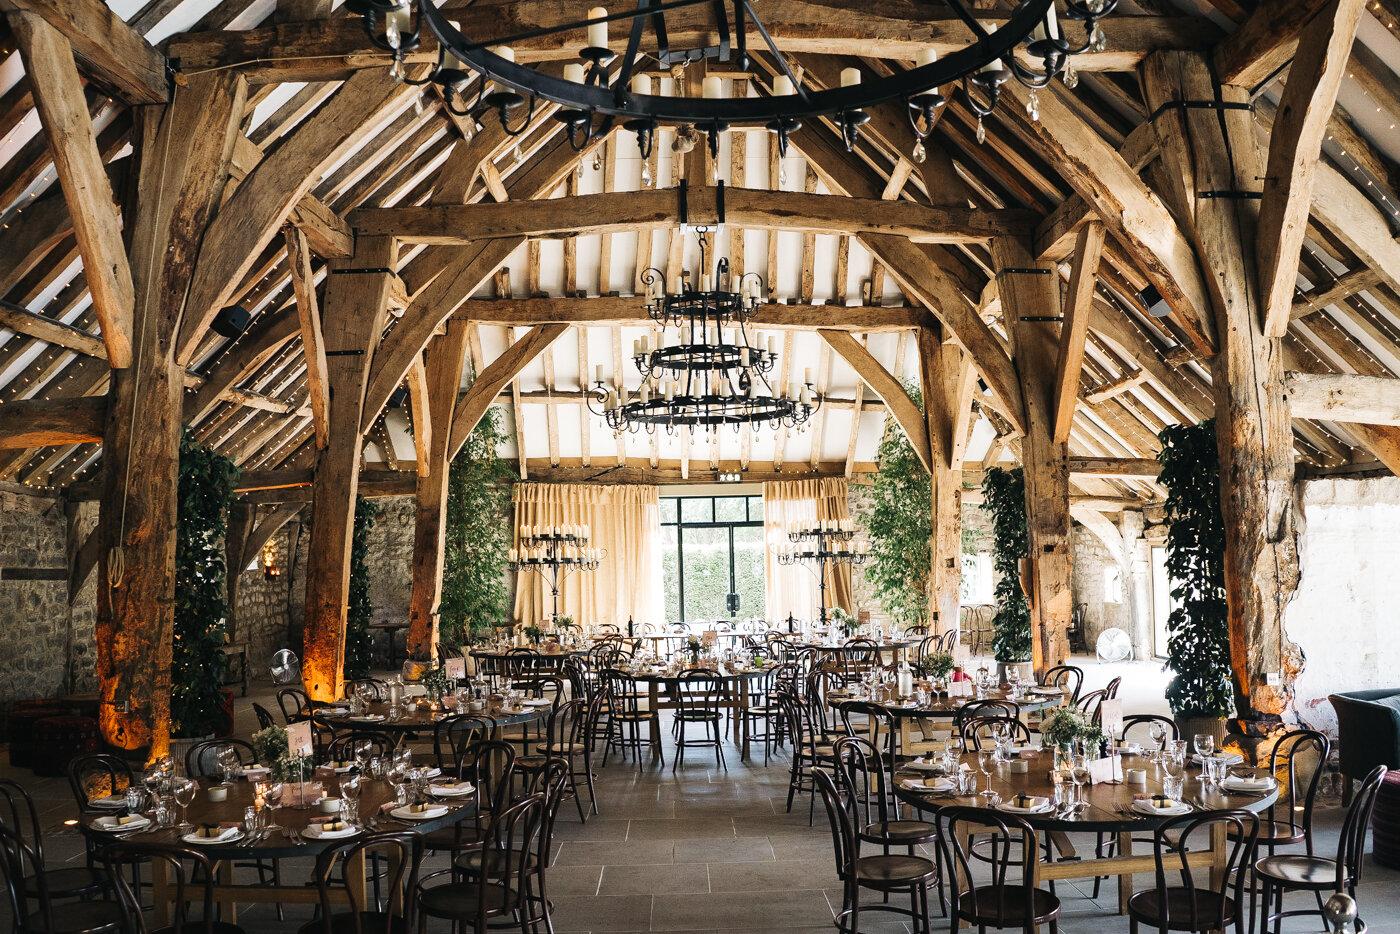 tithe-barn-bolton-abbey-north-yorkshire-cripps-wedding-photographer-creative-0037.jpg